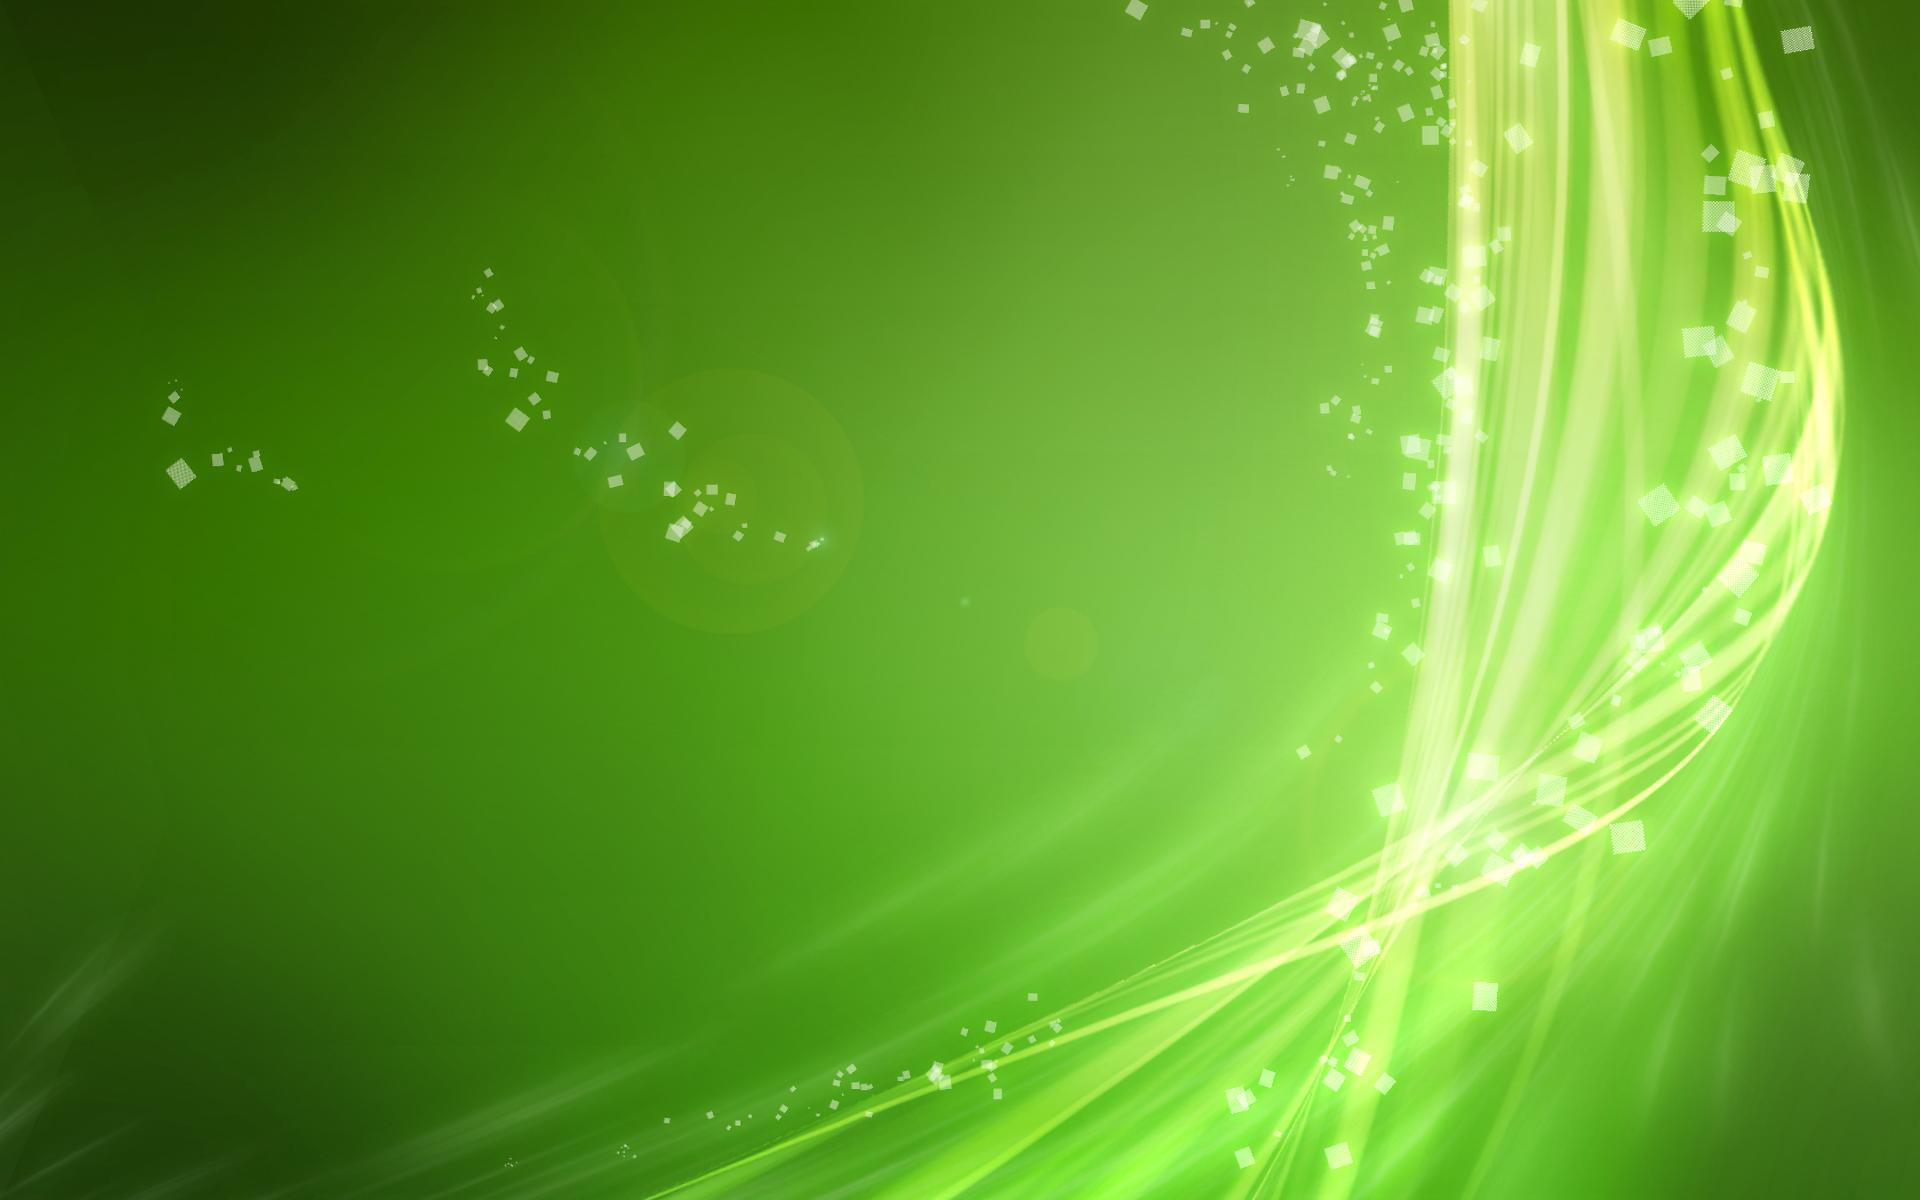 Green Hd Wallpaper Background Image 1920x1200 Id 62233